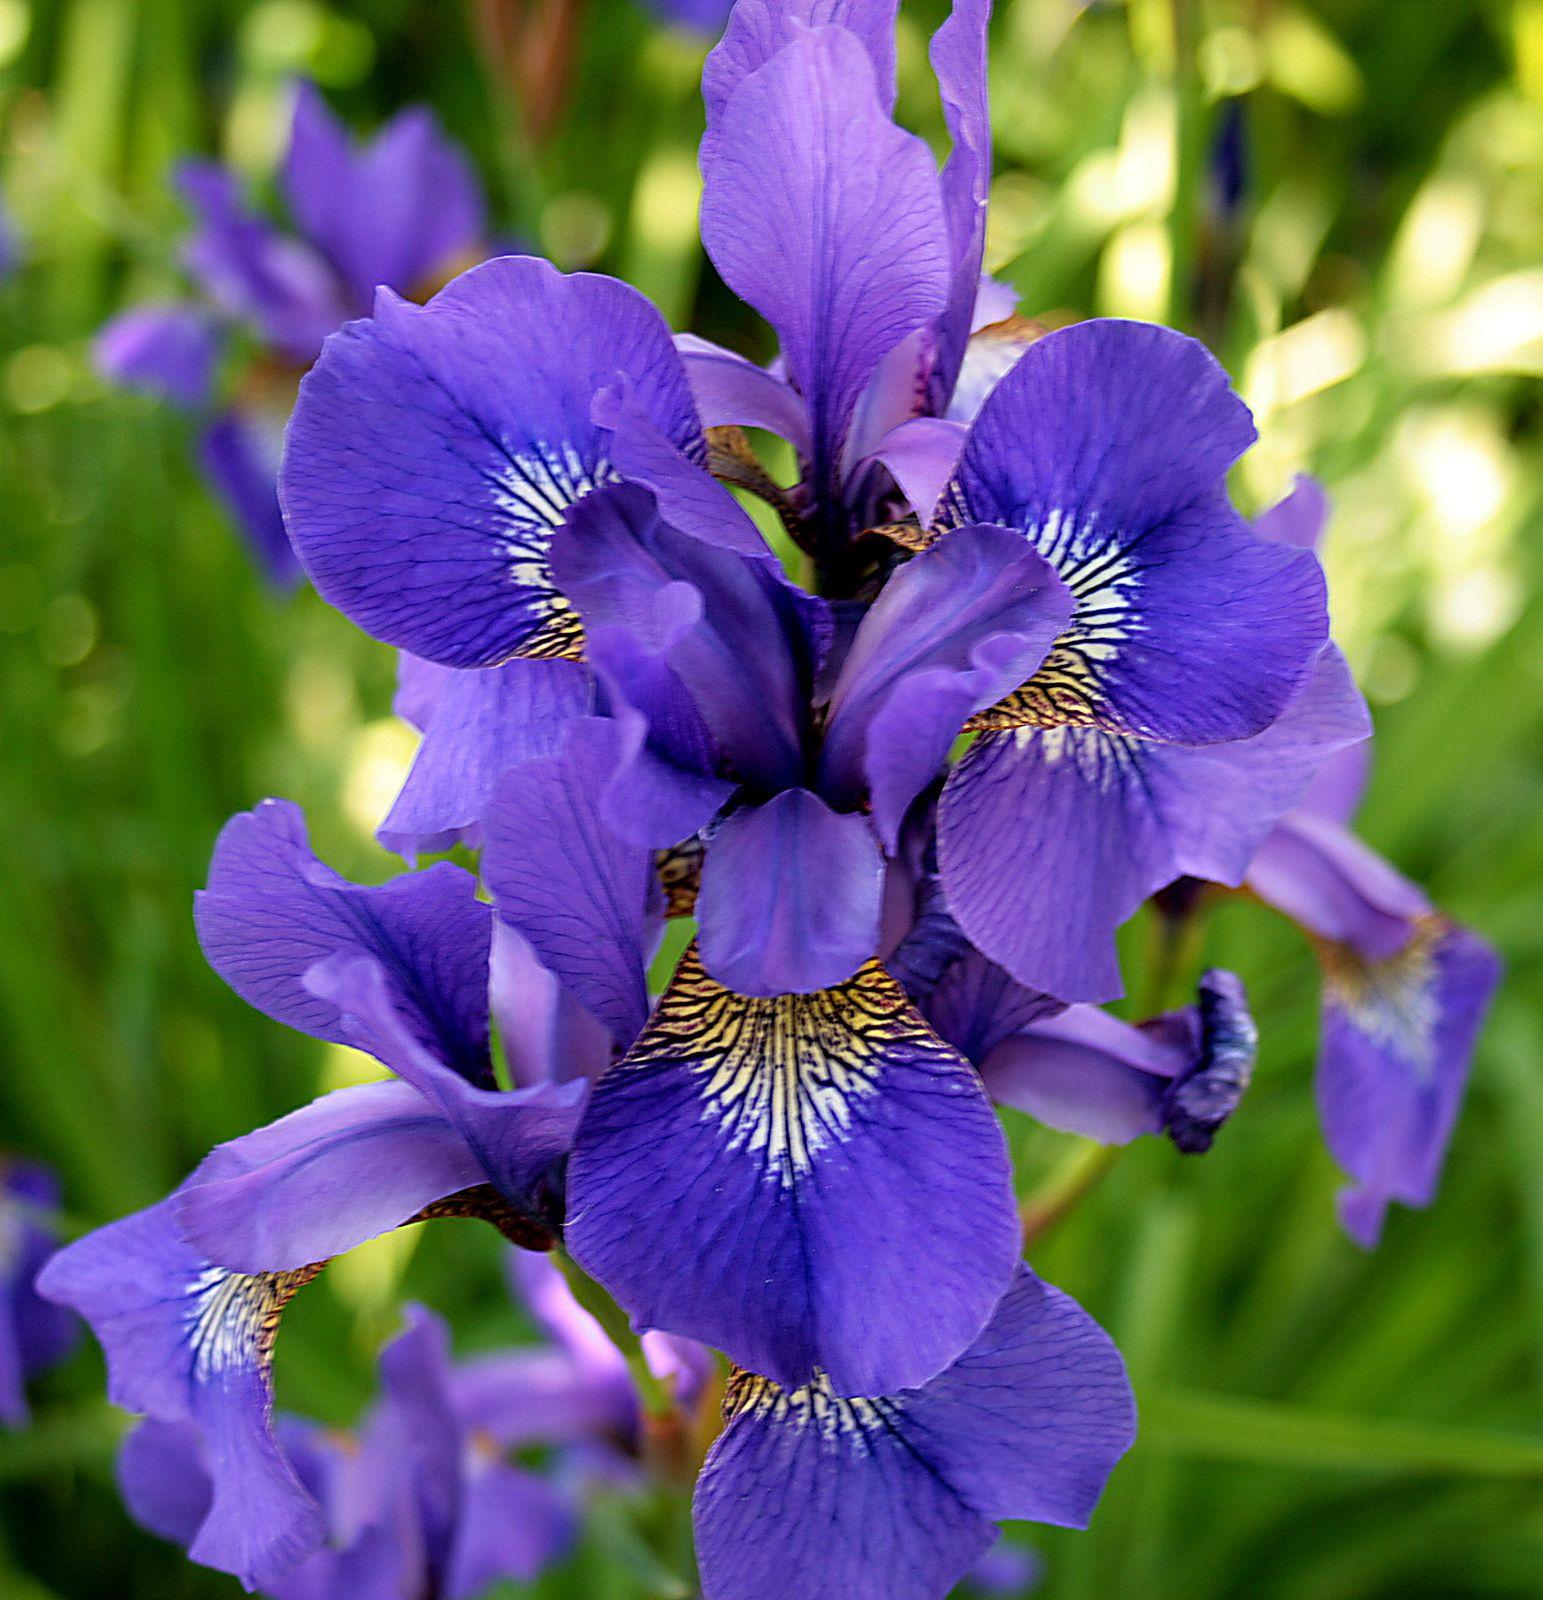 Purple and yellow iris other pinterest iris flowers flowers purple and yellow iris february birth flowers flowers garden iris flowers purple flowers izmirmasajfo